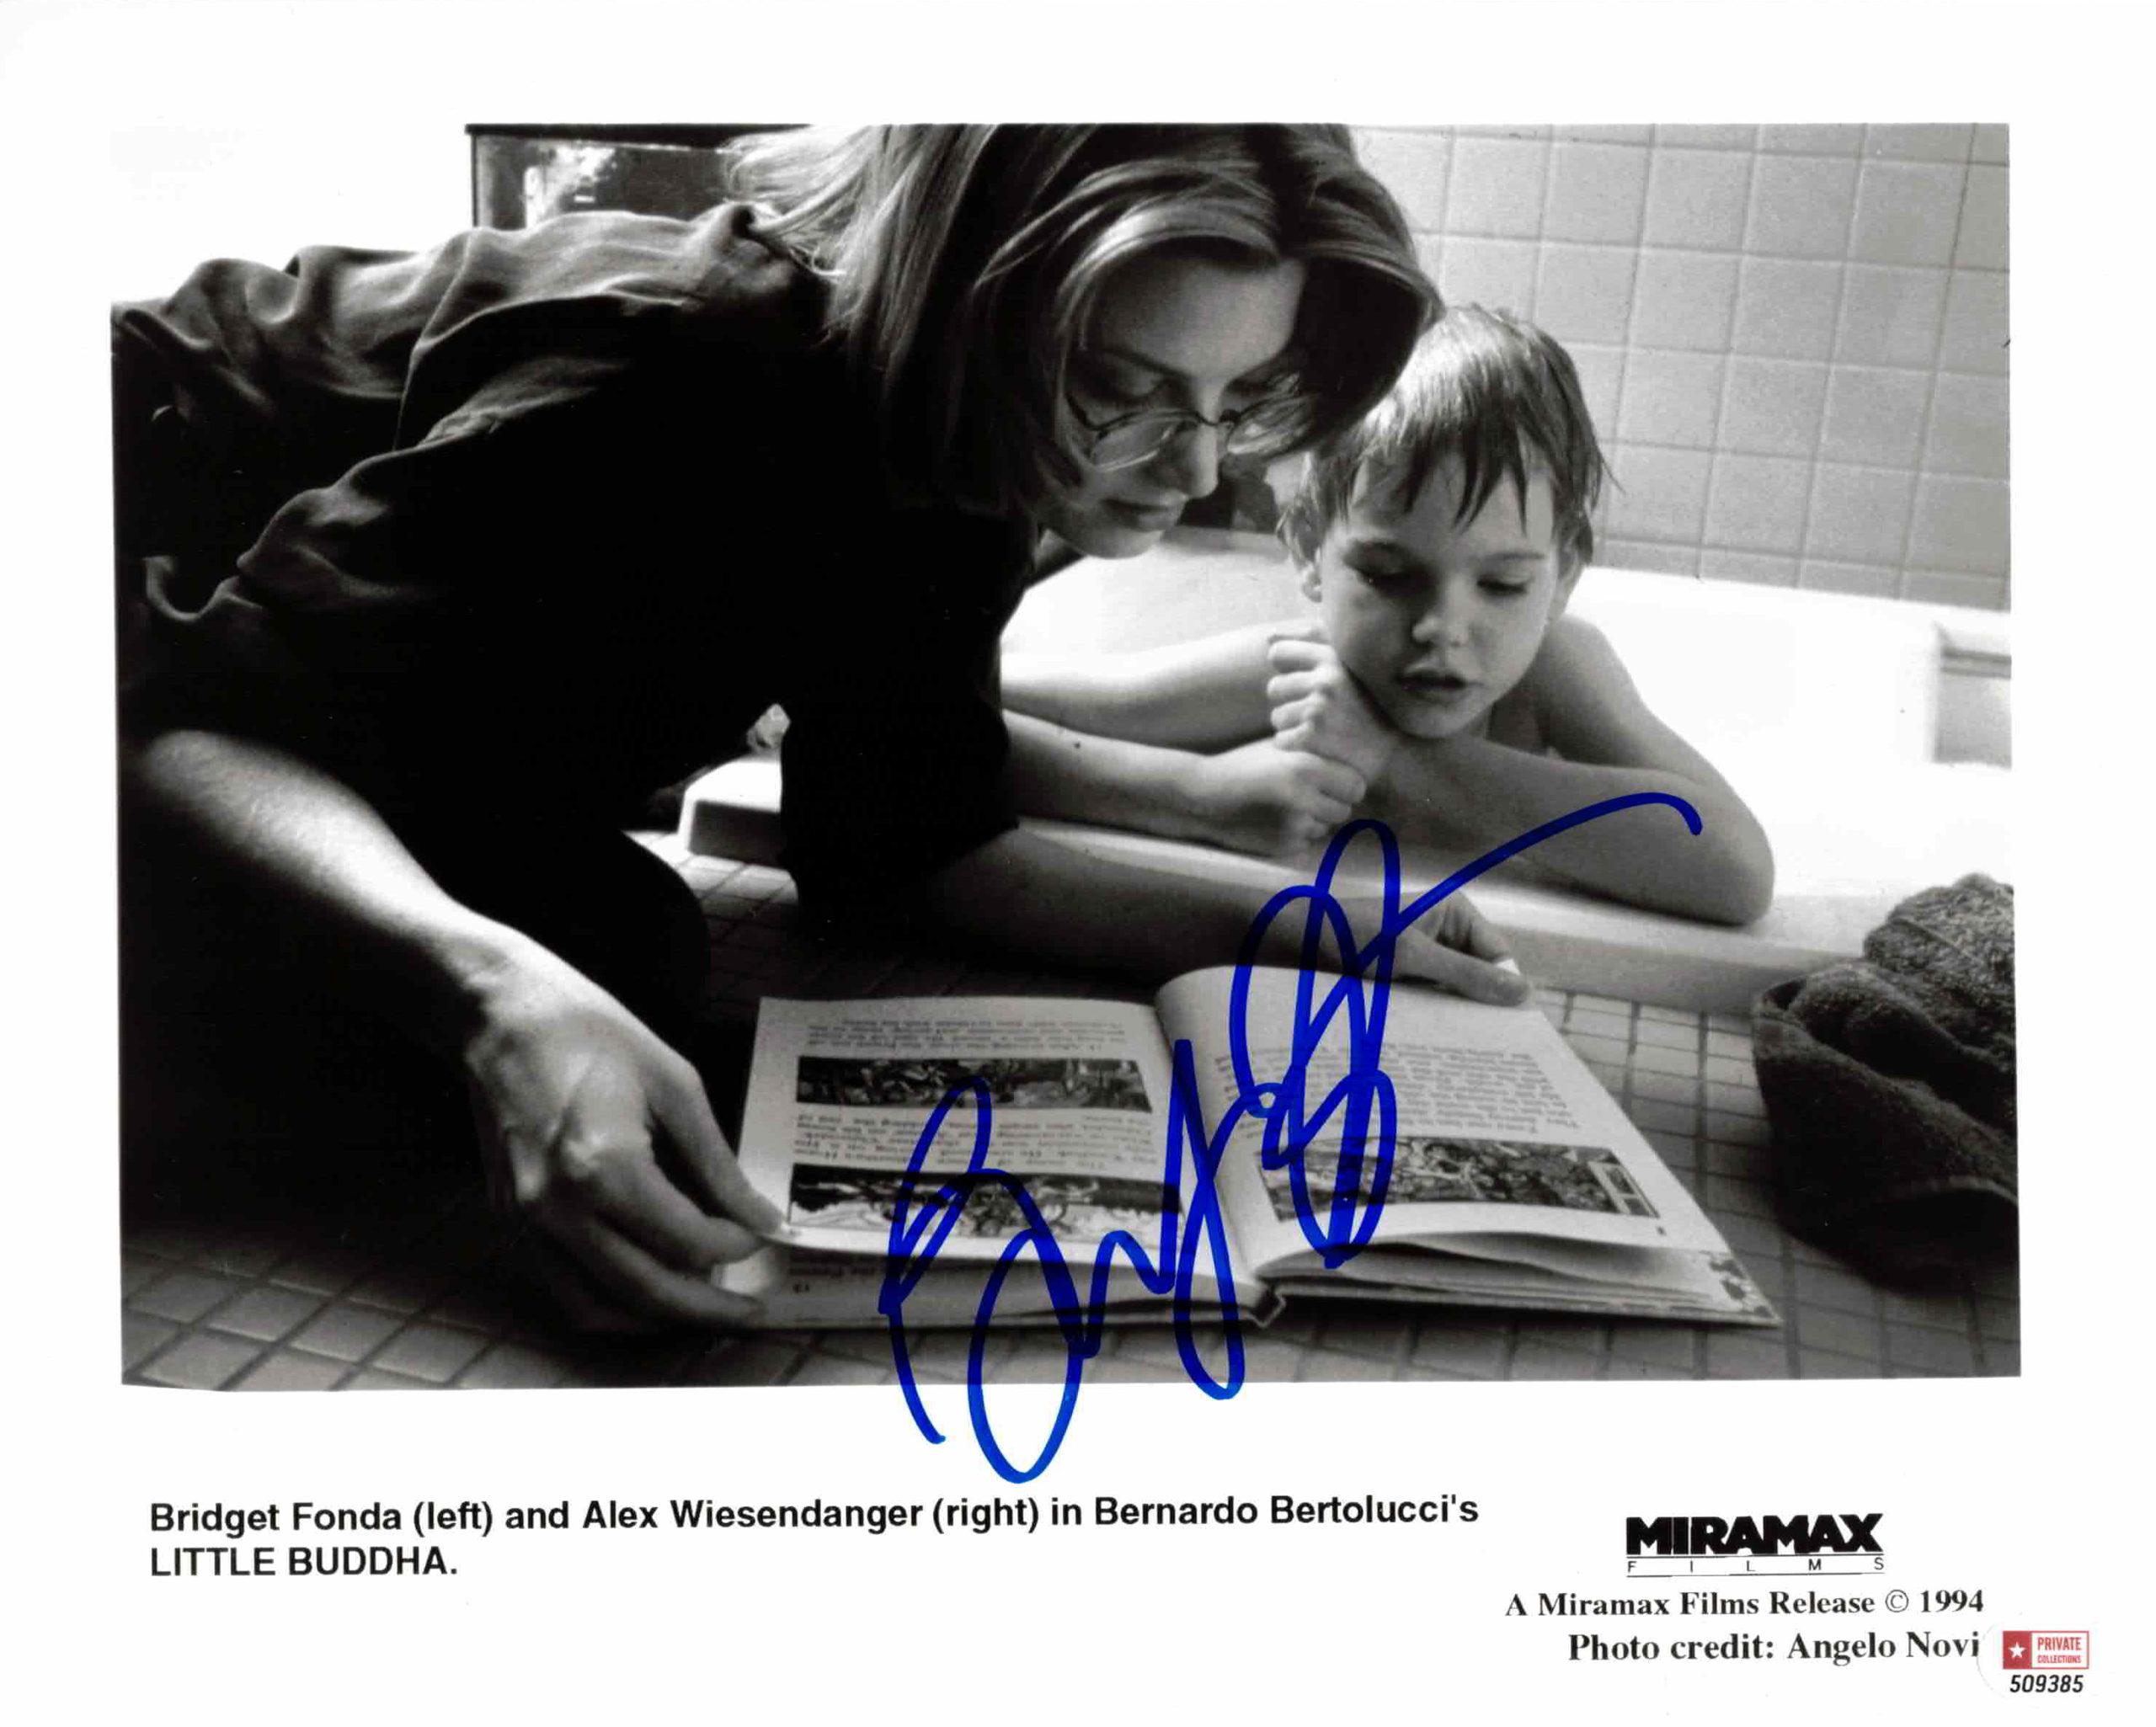 Bridget Fonda - autogram